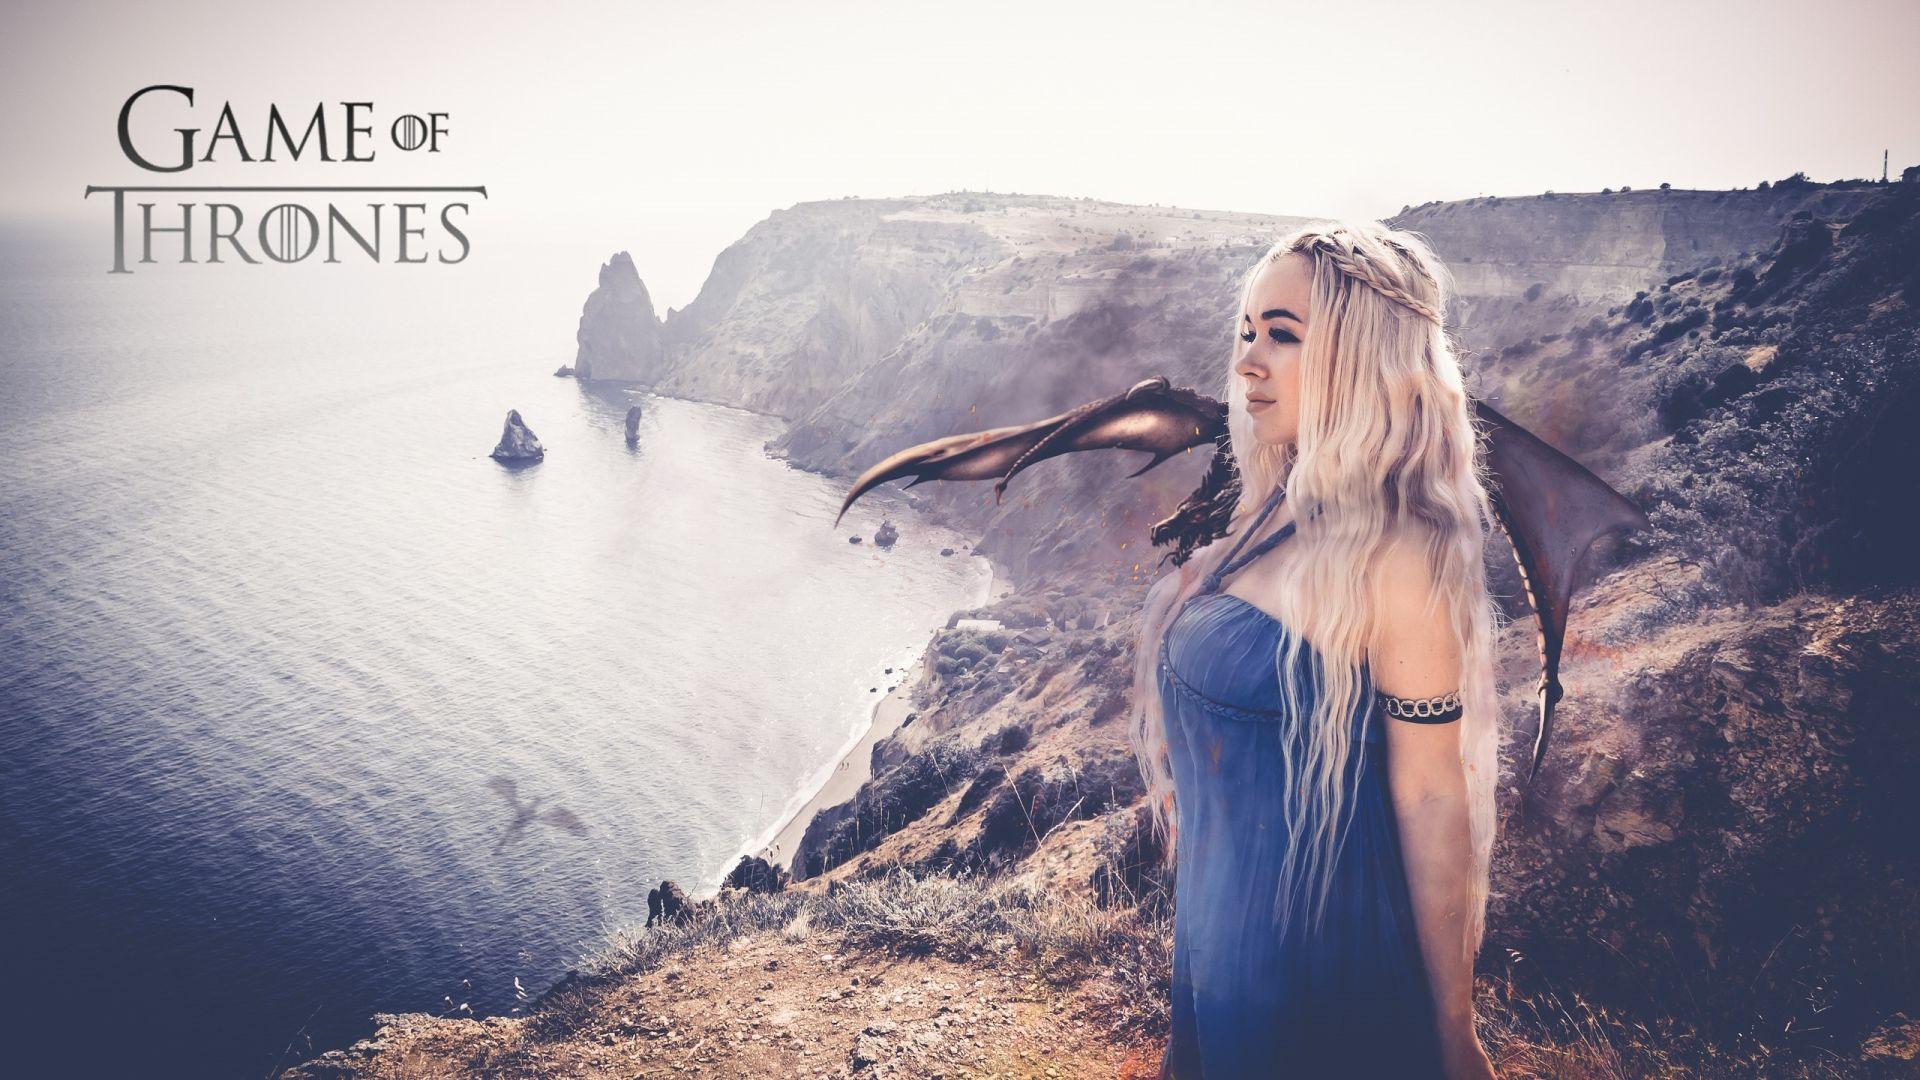 Game of Thrones Daenerys cosplay wallpaper